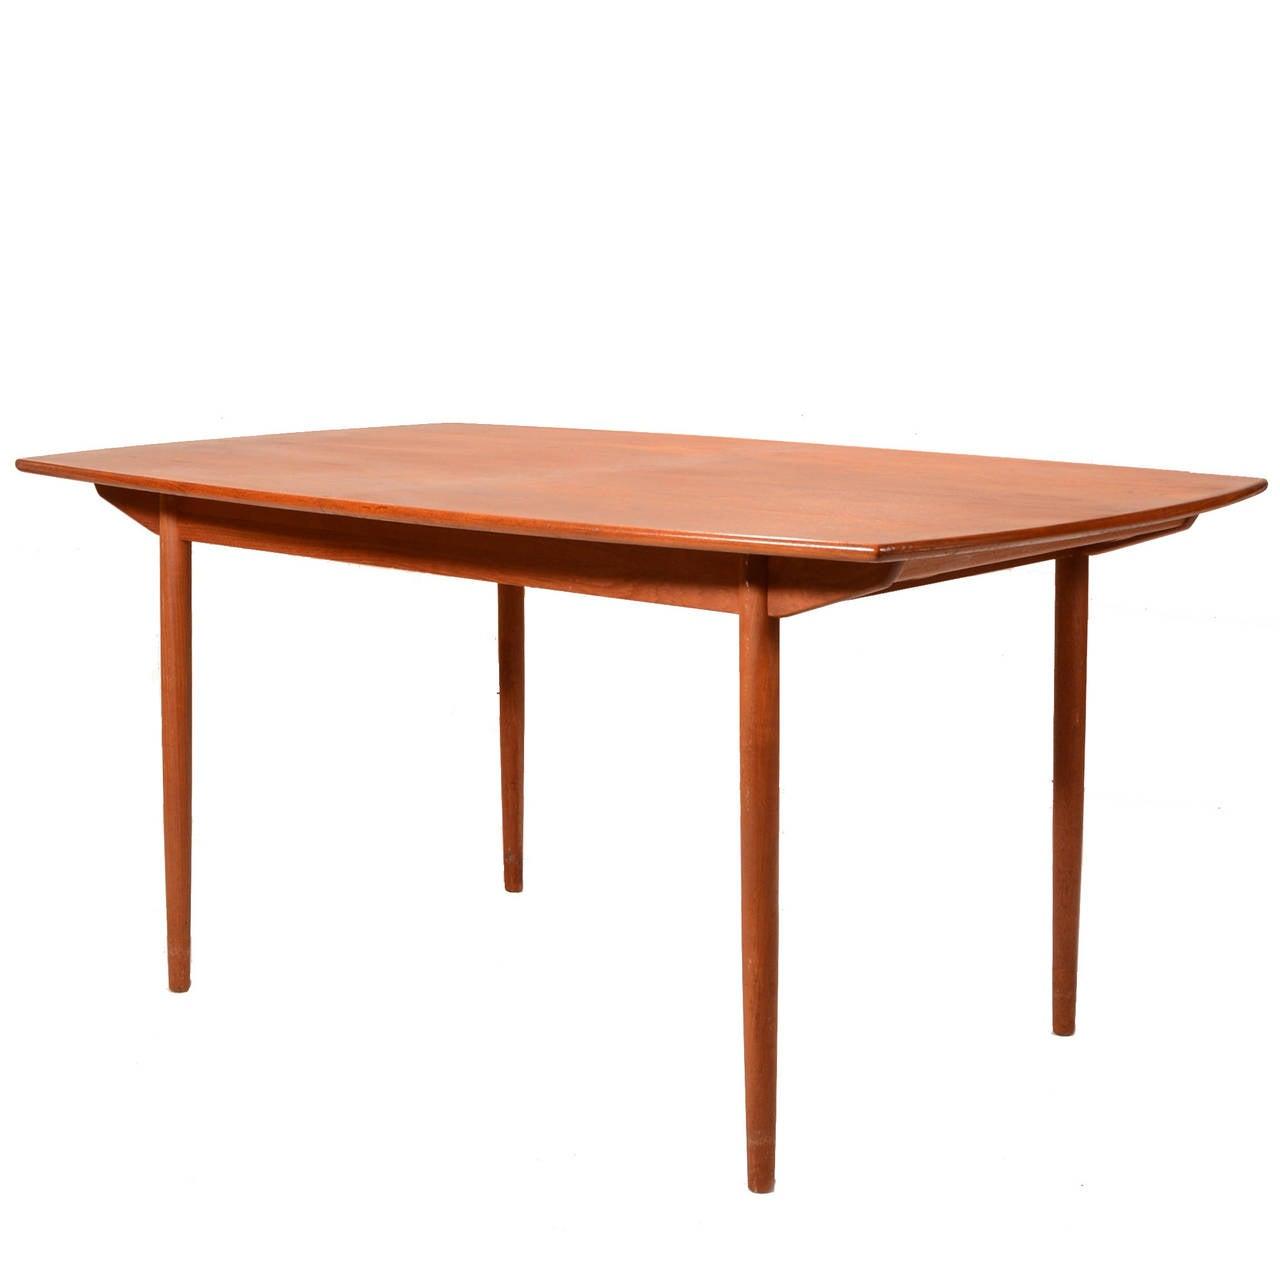 Mid Century Modern Teak Extending Dining Table At 1stdibs